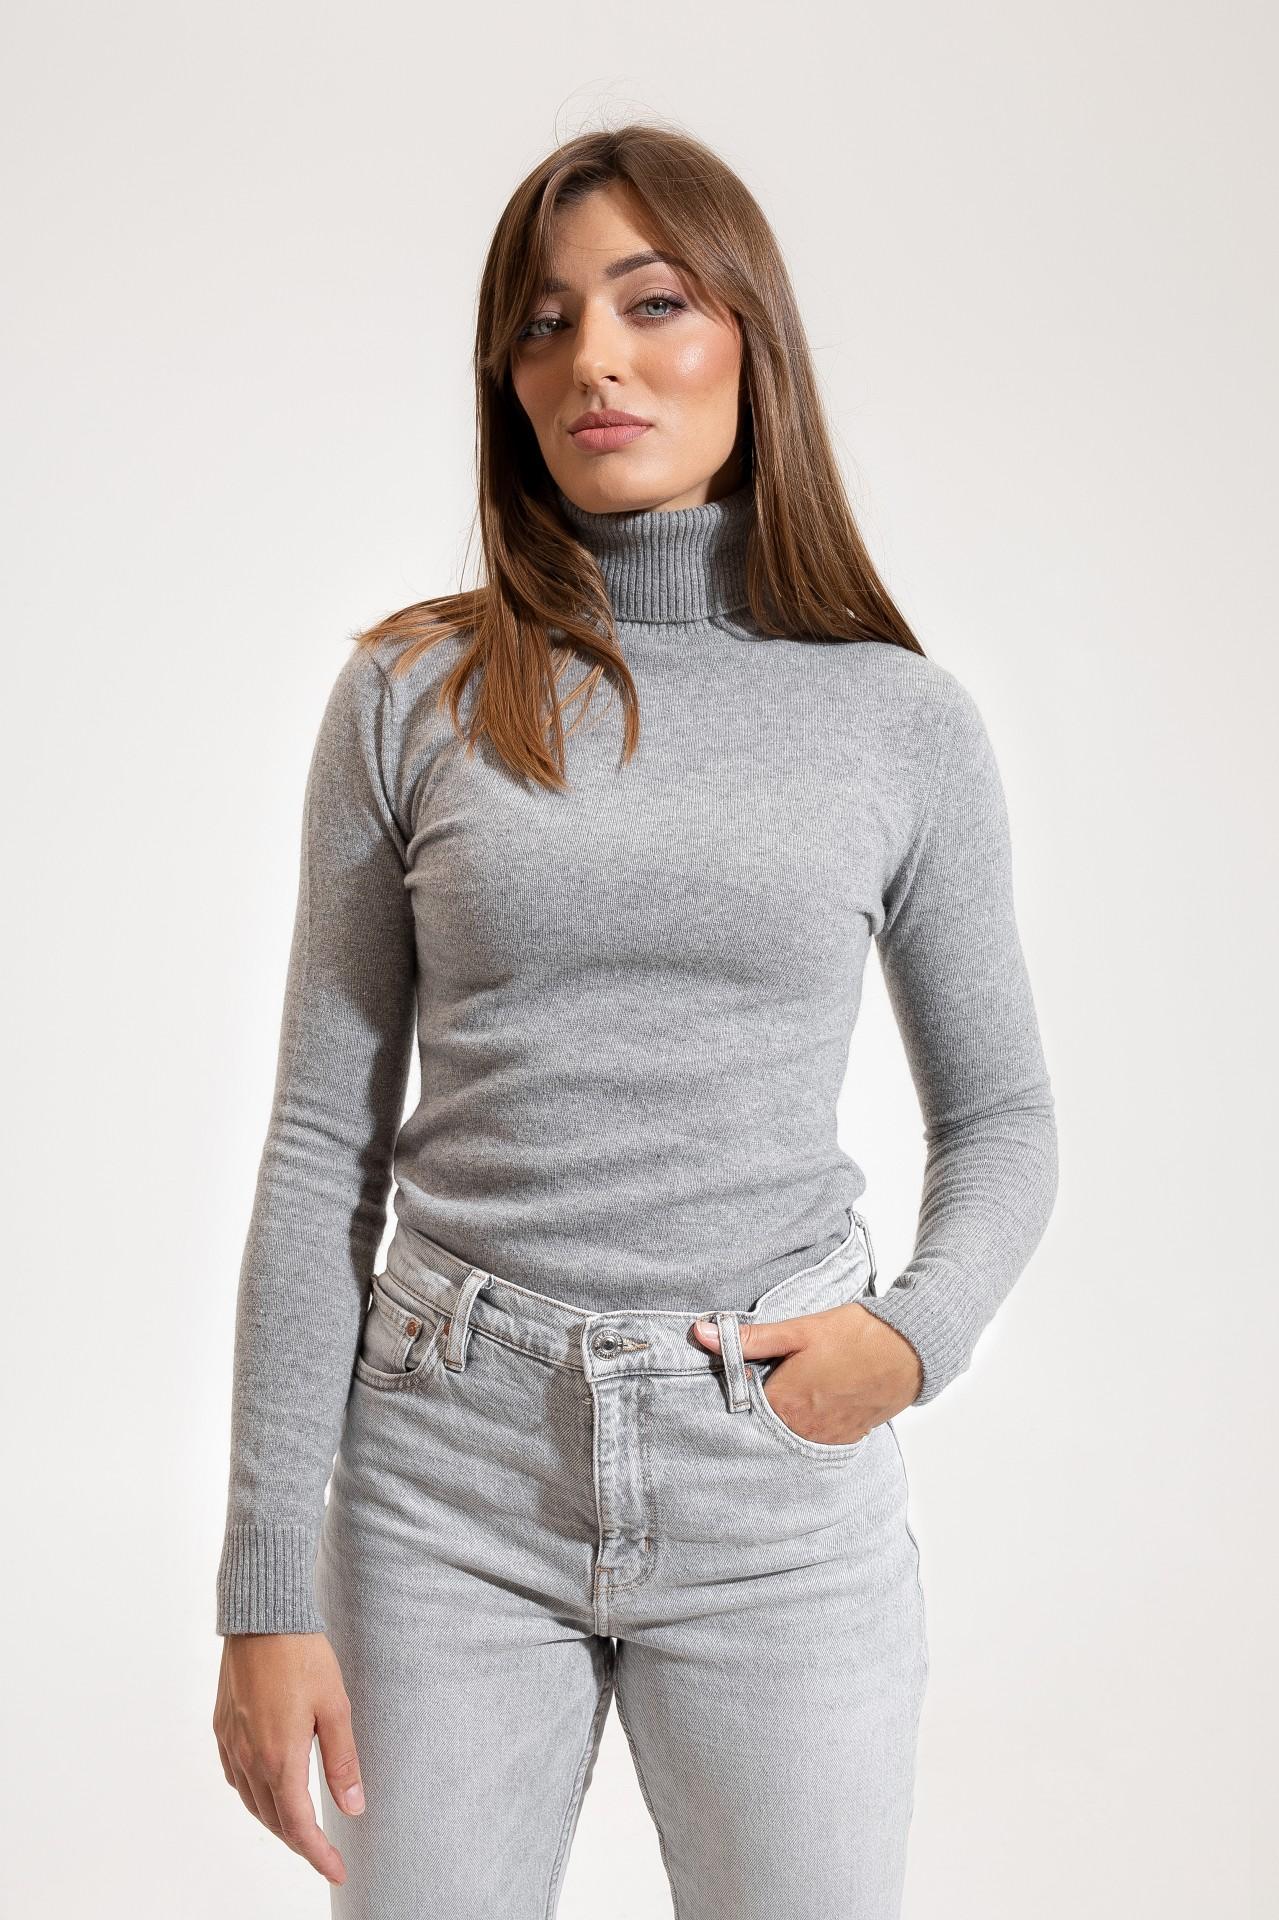 Turtleneck Light Grey